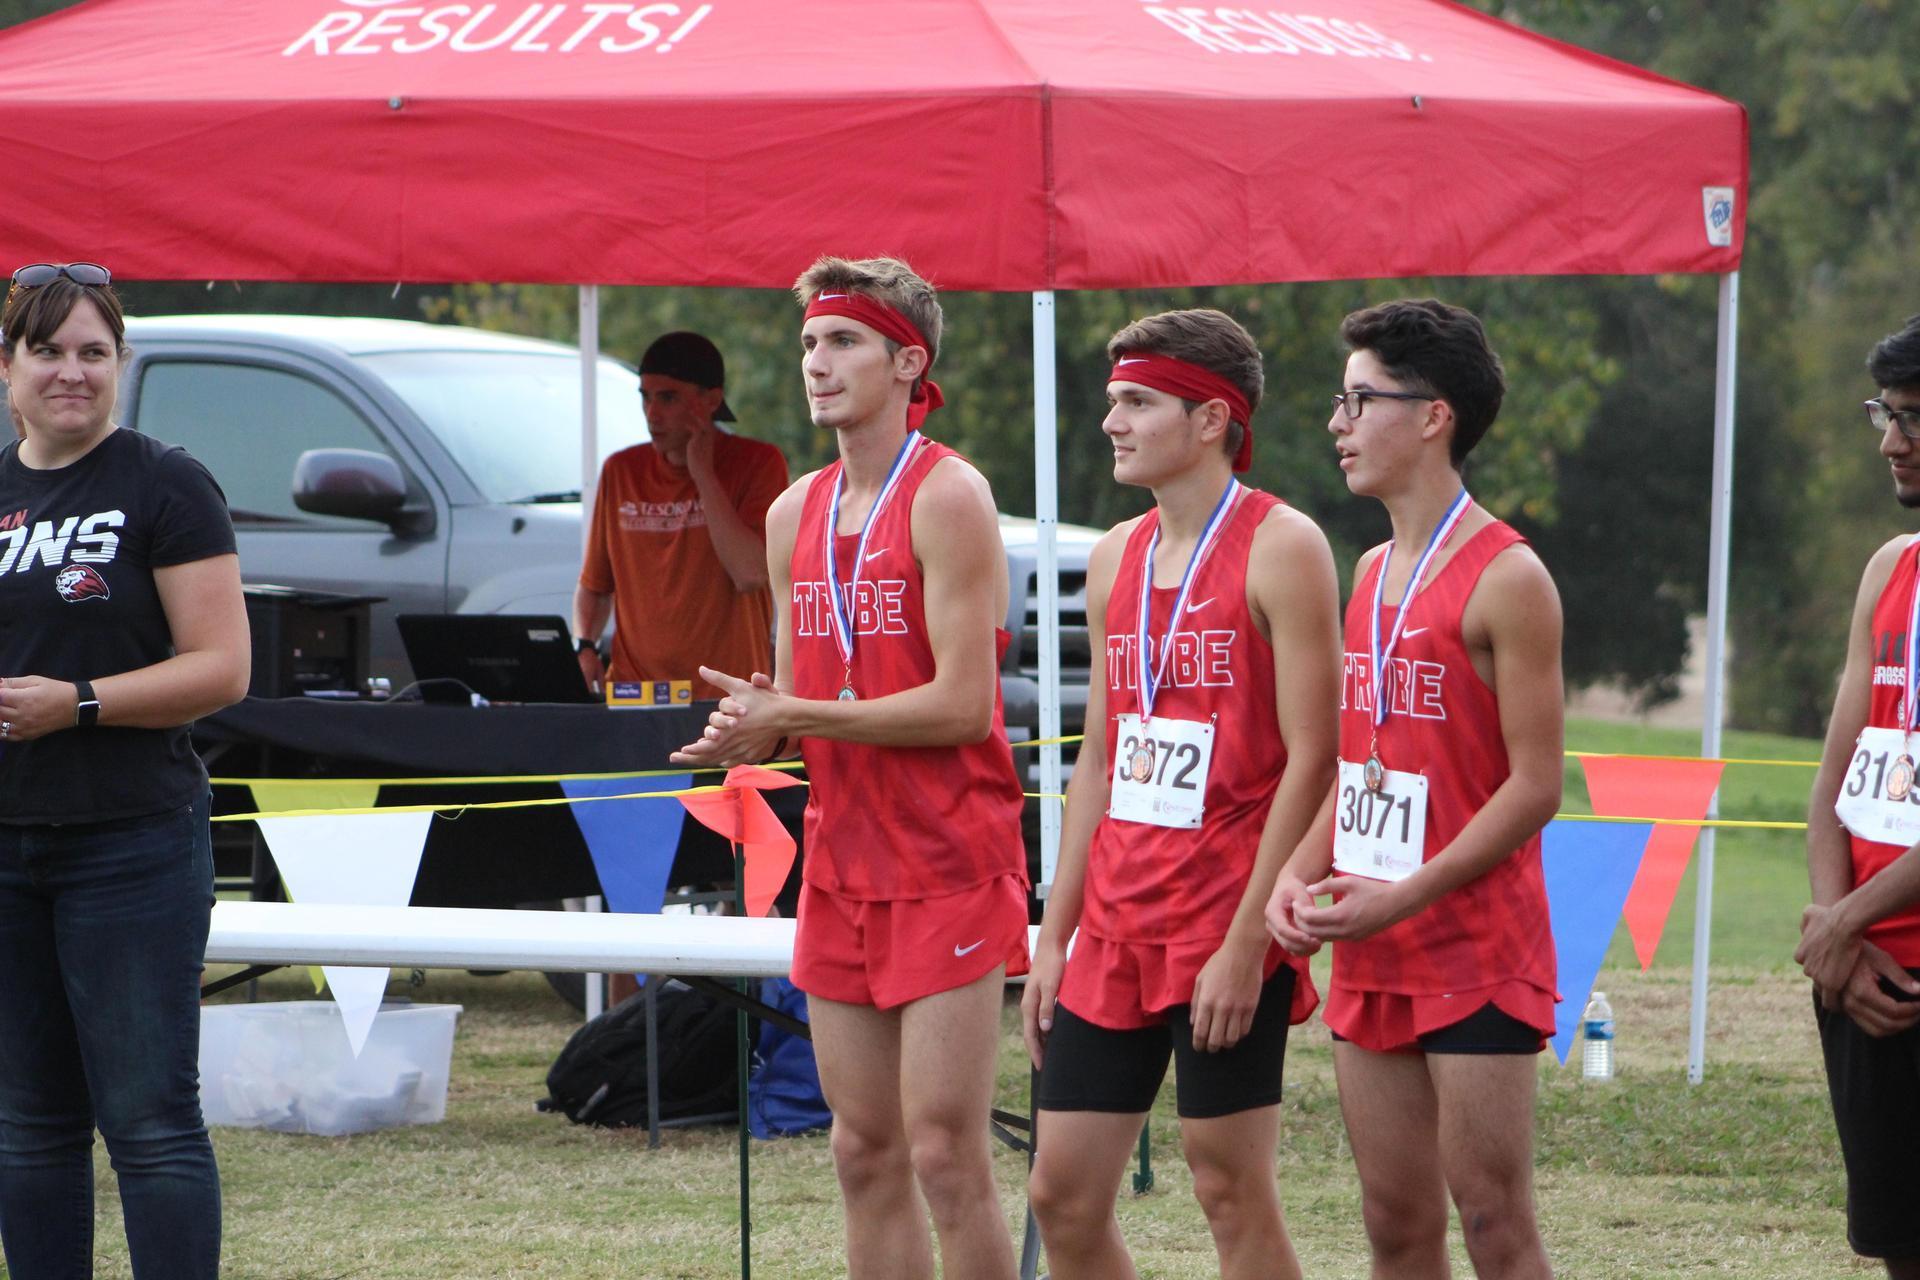 Michael Eggert, Andrew Castaneda, and Ryan Diaz after receiving medals